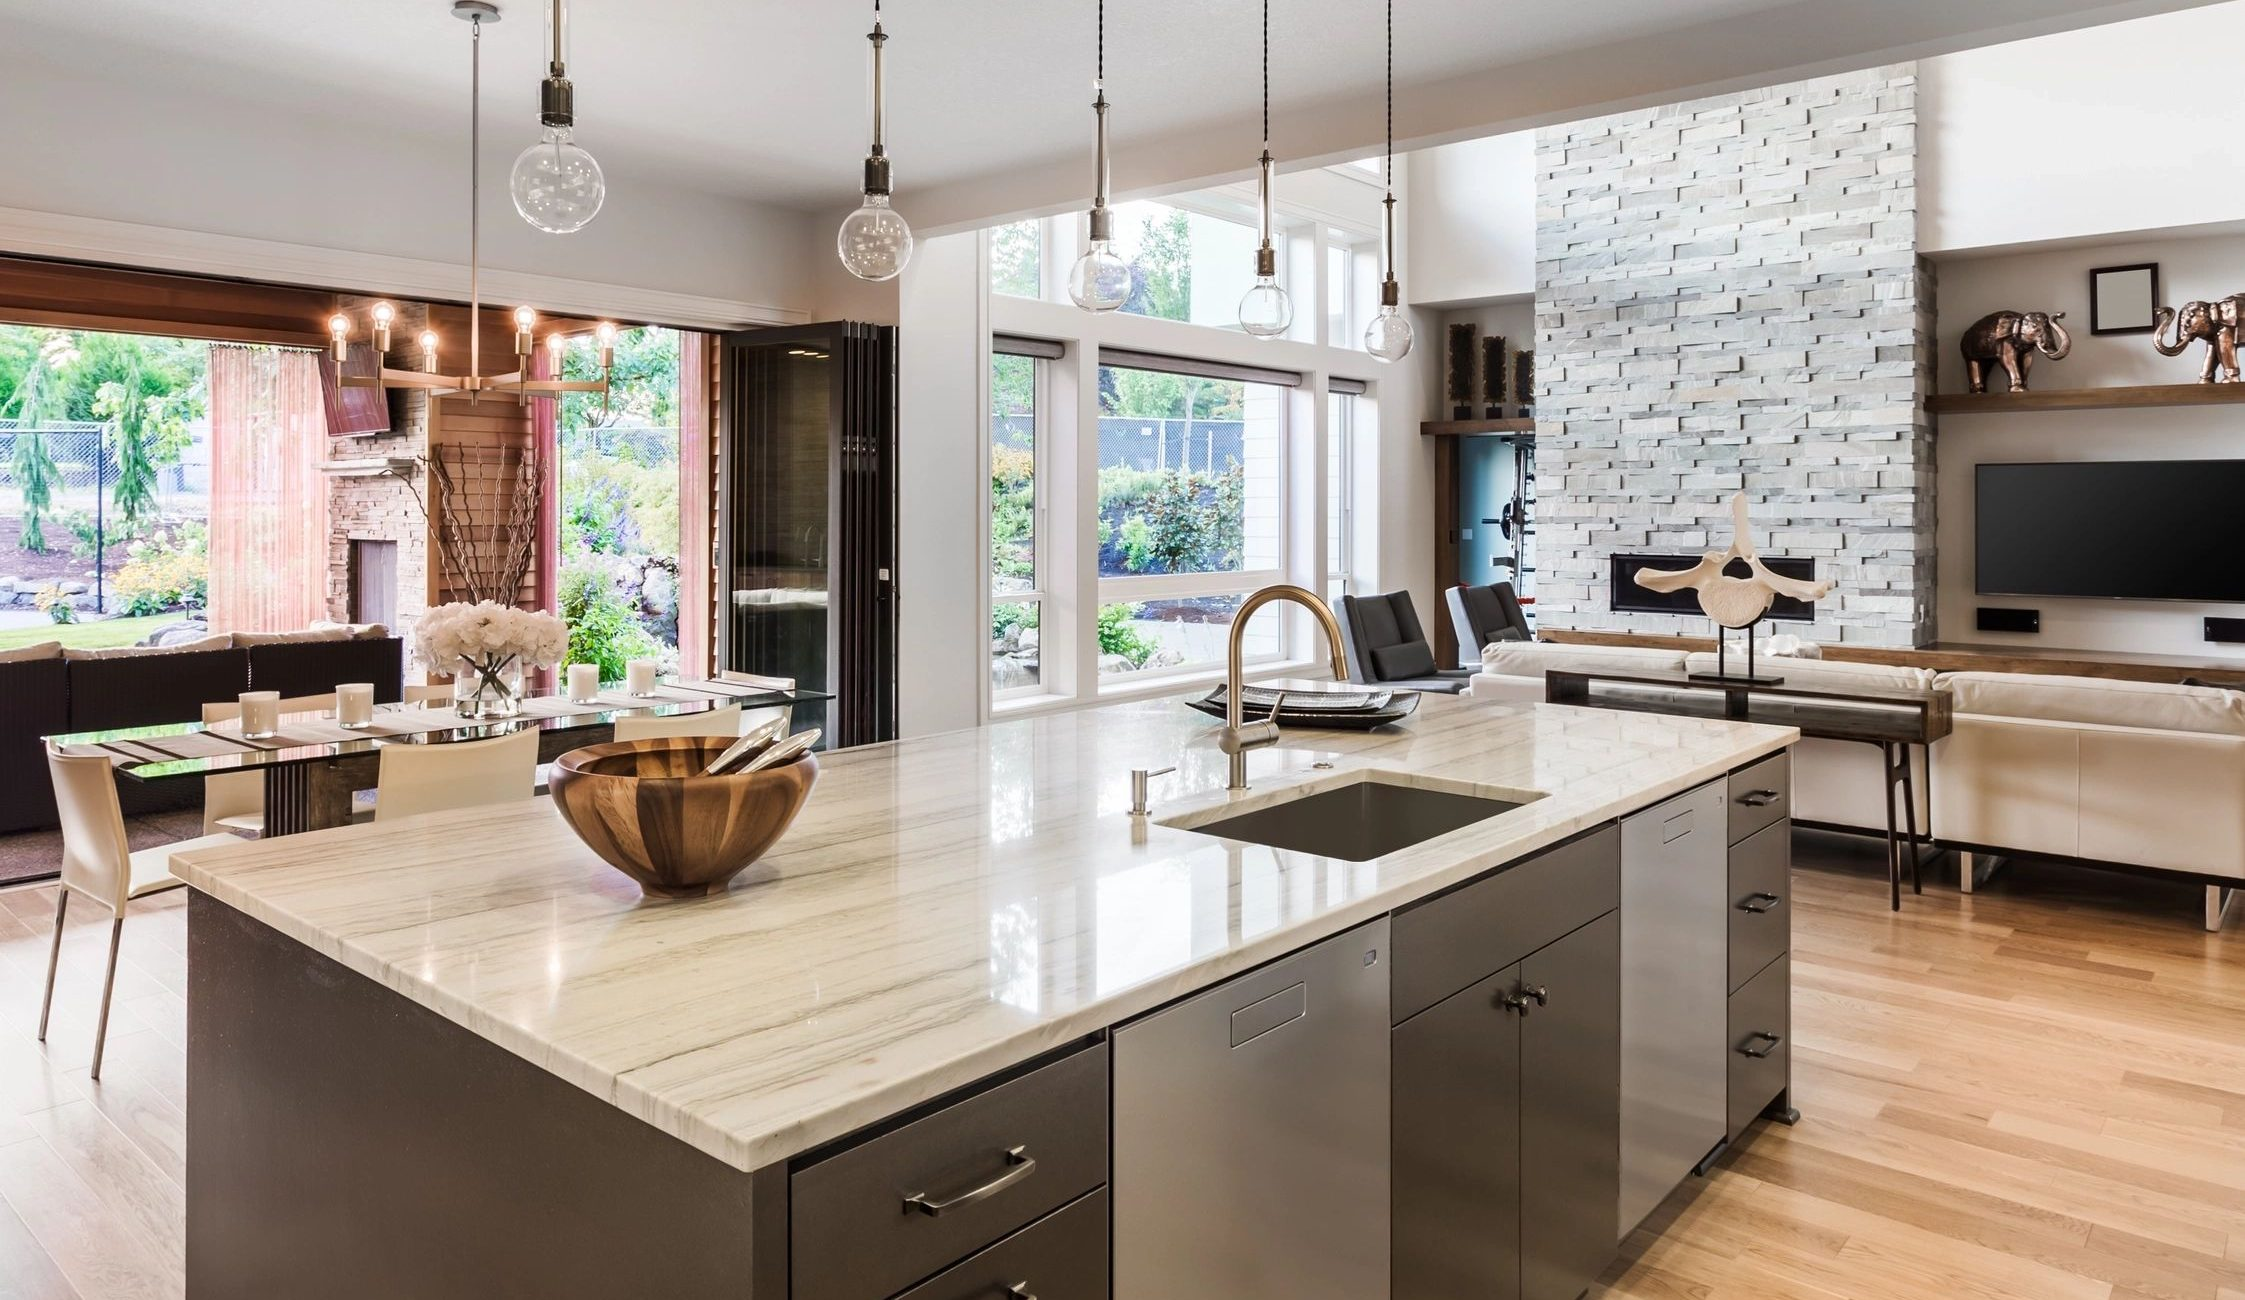 Residential Kitchen Leak Detection